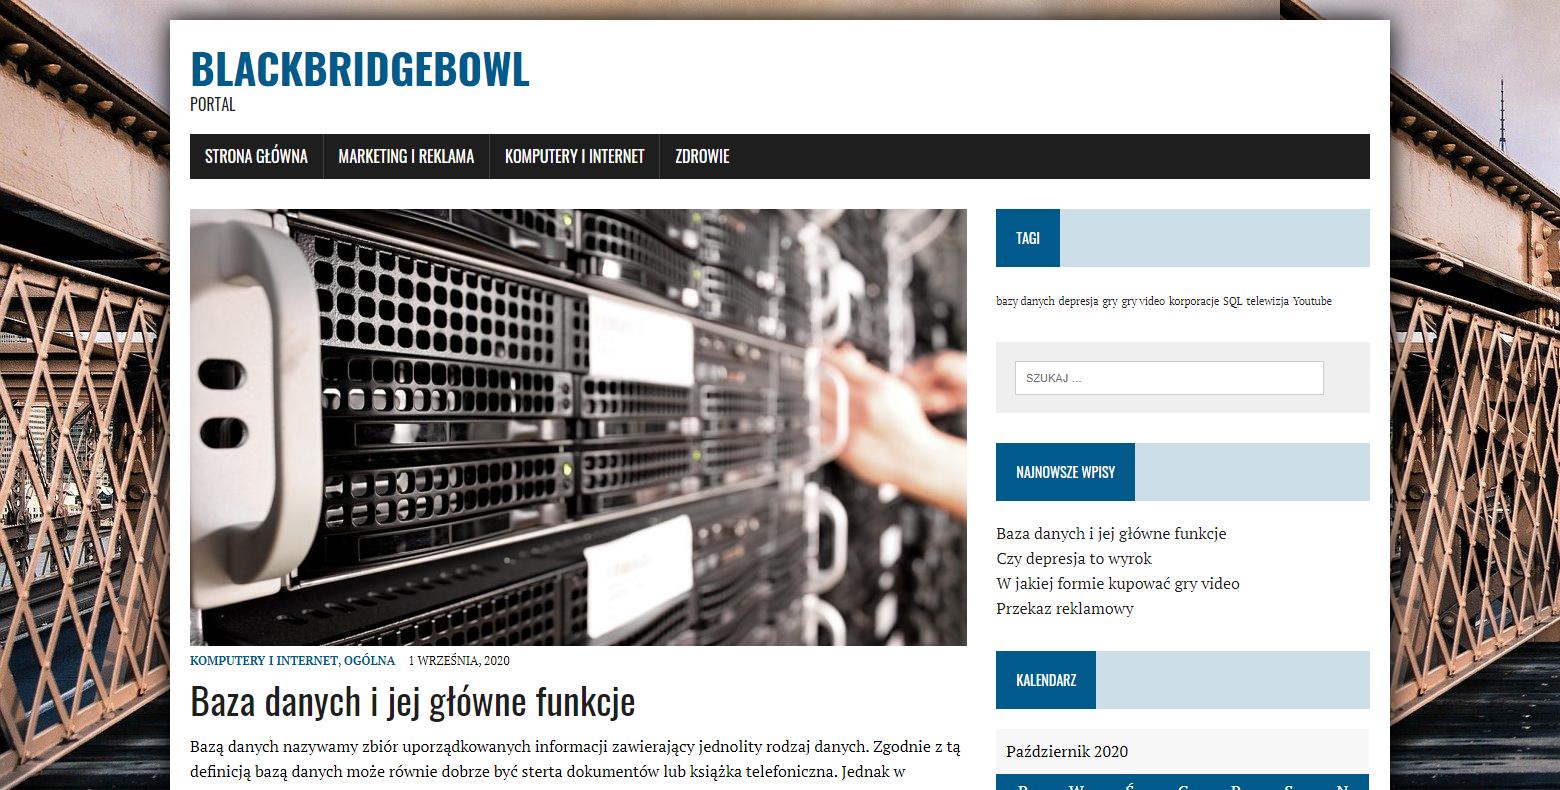 Blackbridgebowl Portal